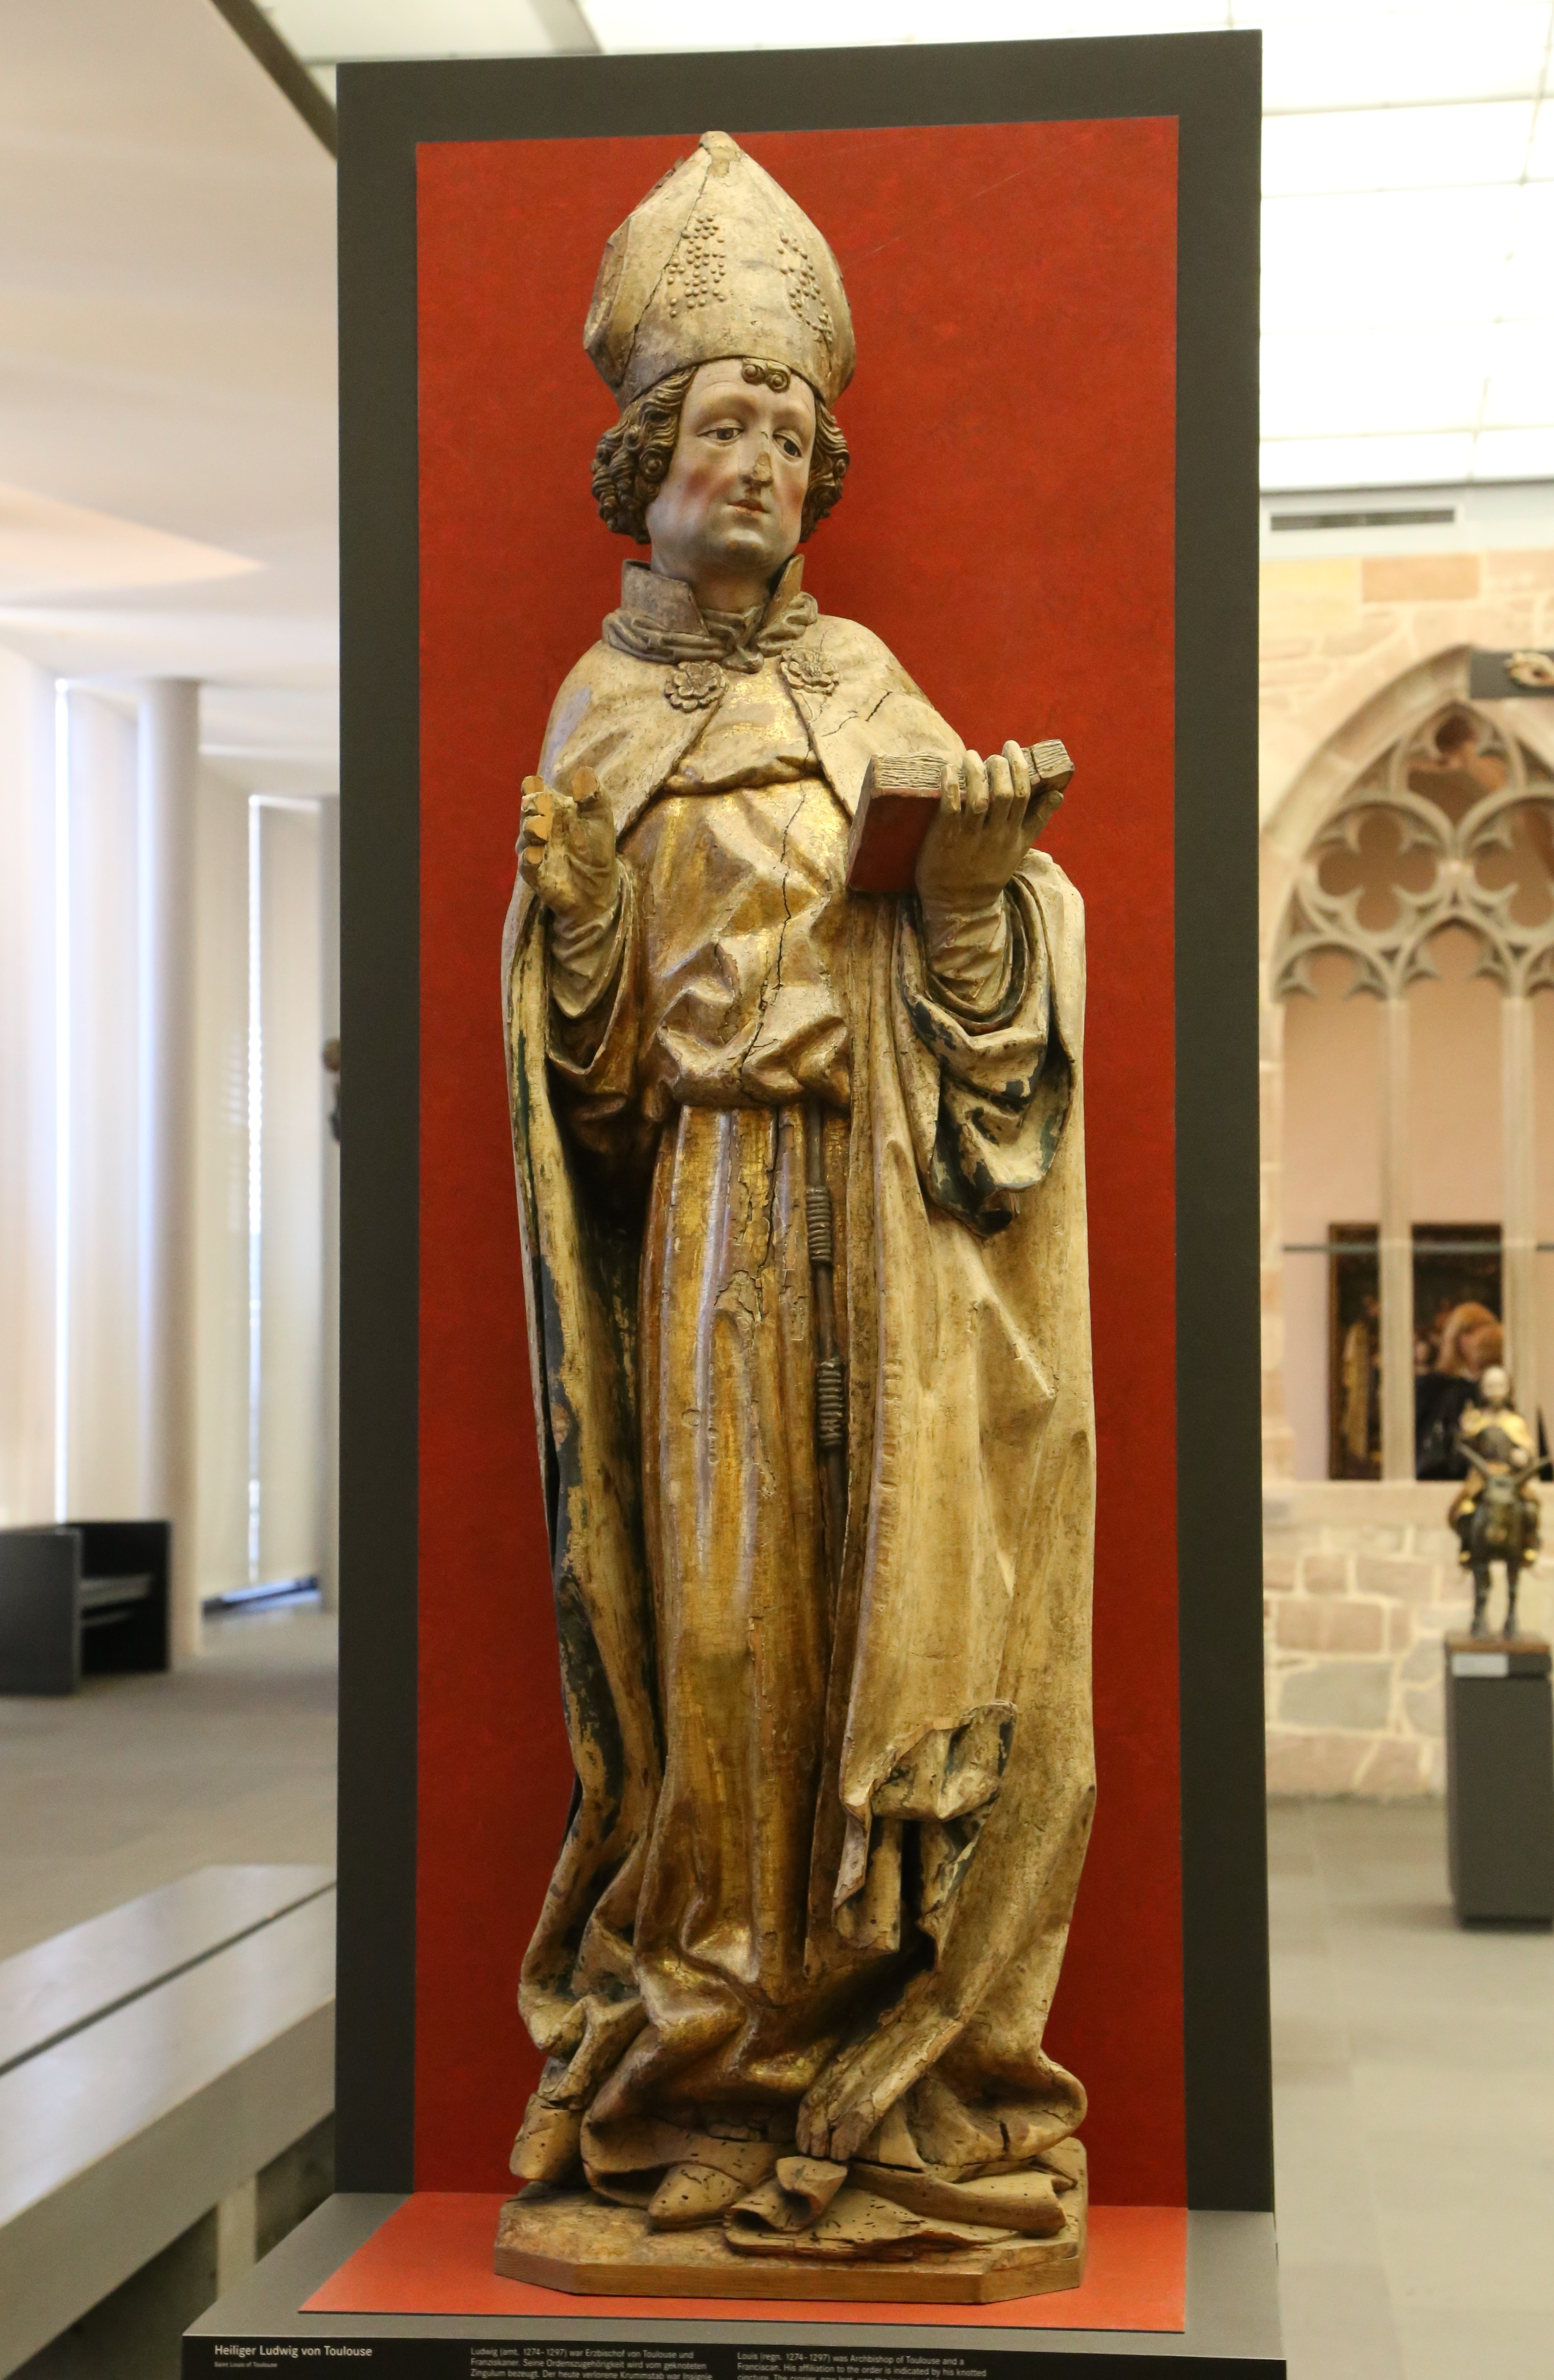 https://upload.wikimedia.org/wikipedia/commons/b/b7/Heiliger_Ludwig_von_Toulouse_Nuernberg_um_1450_Lindenholz_GNM_Nuernberg-1.jpg